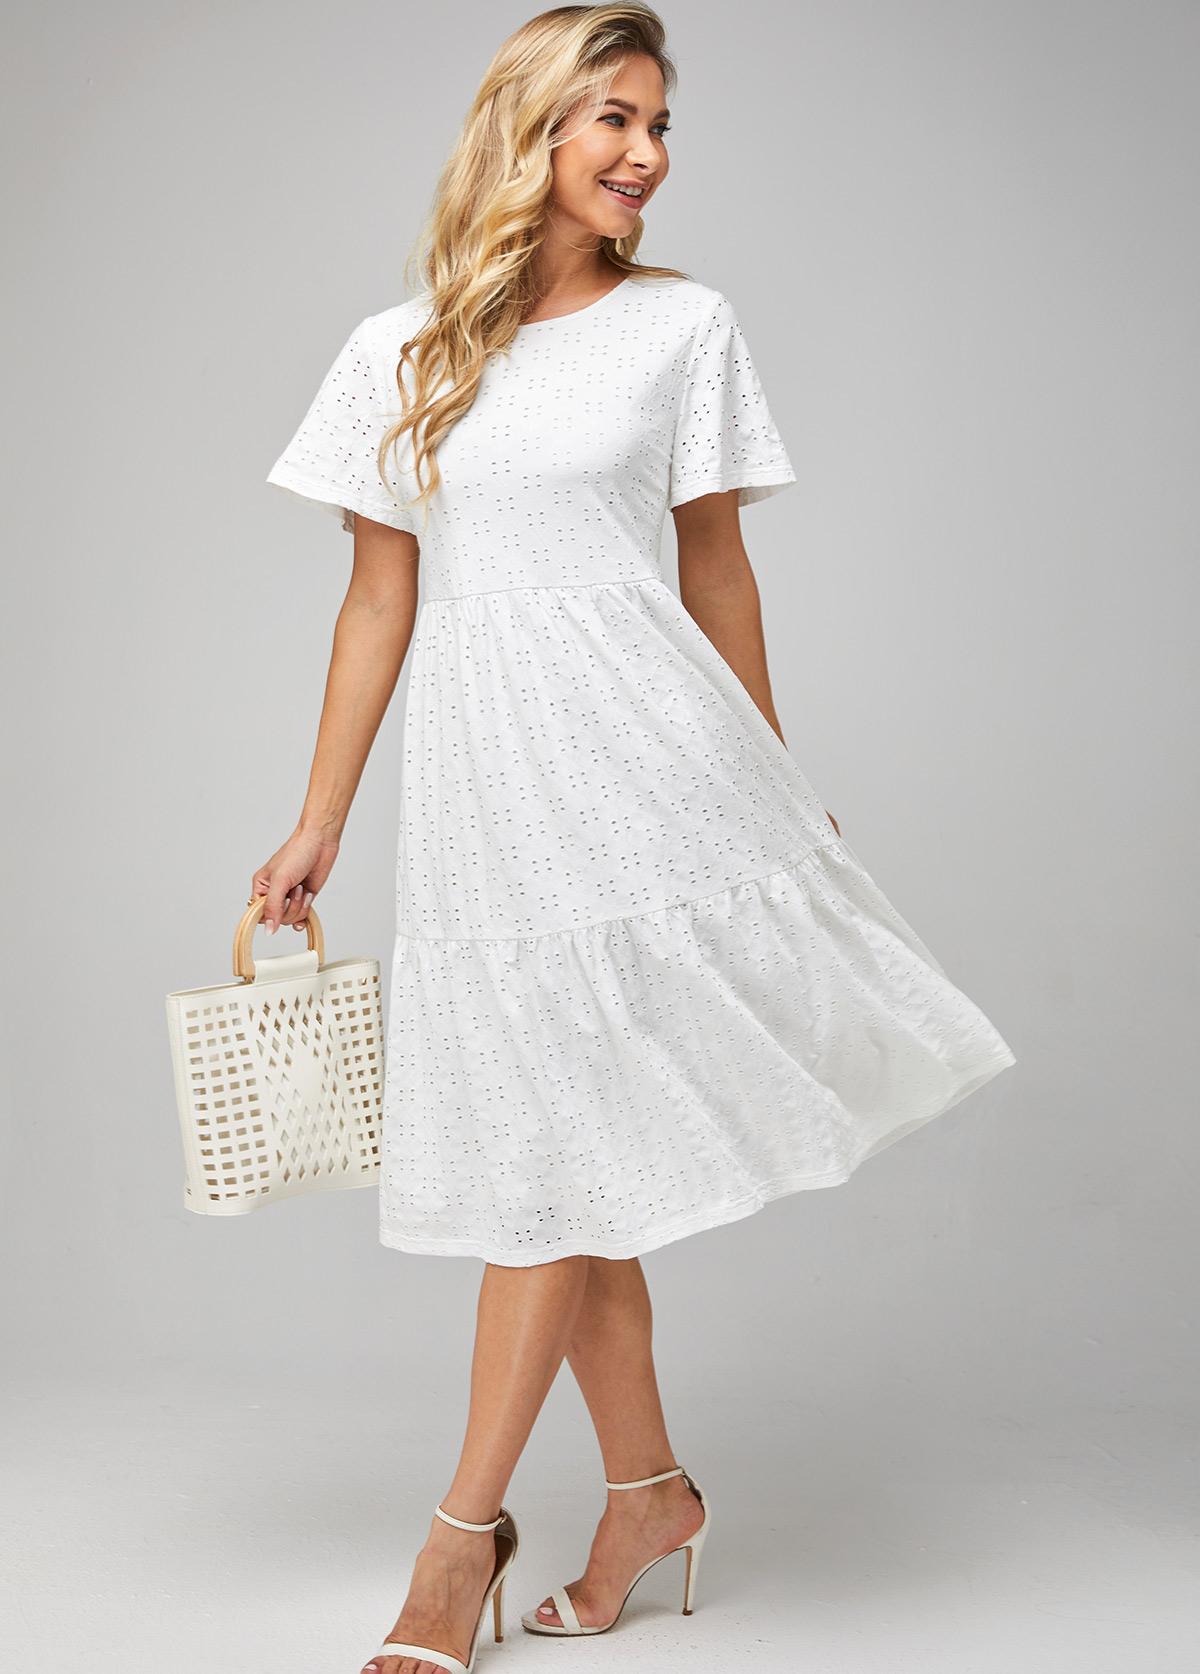 ROTITA Solid Round Neck Short Sleeve Dress